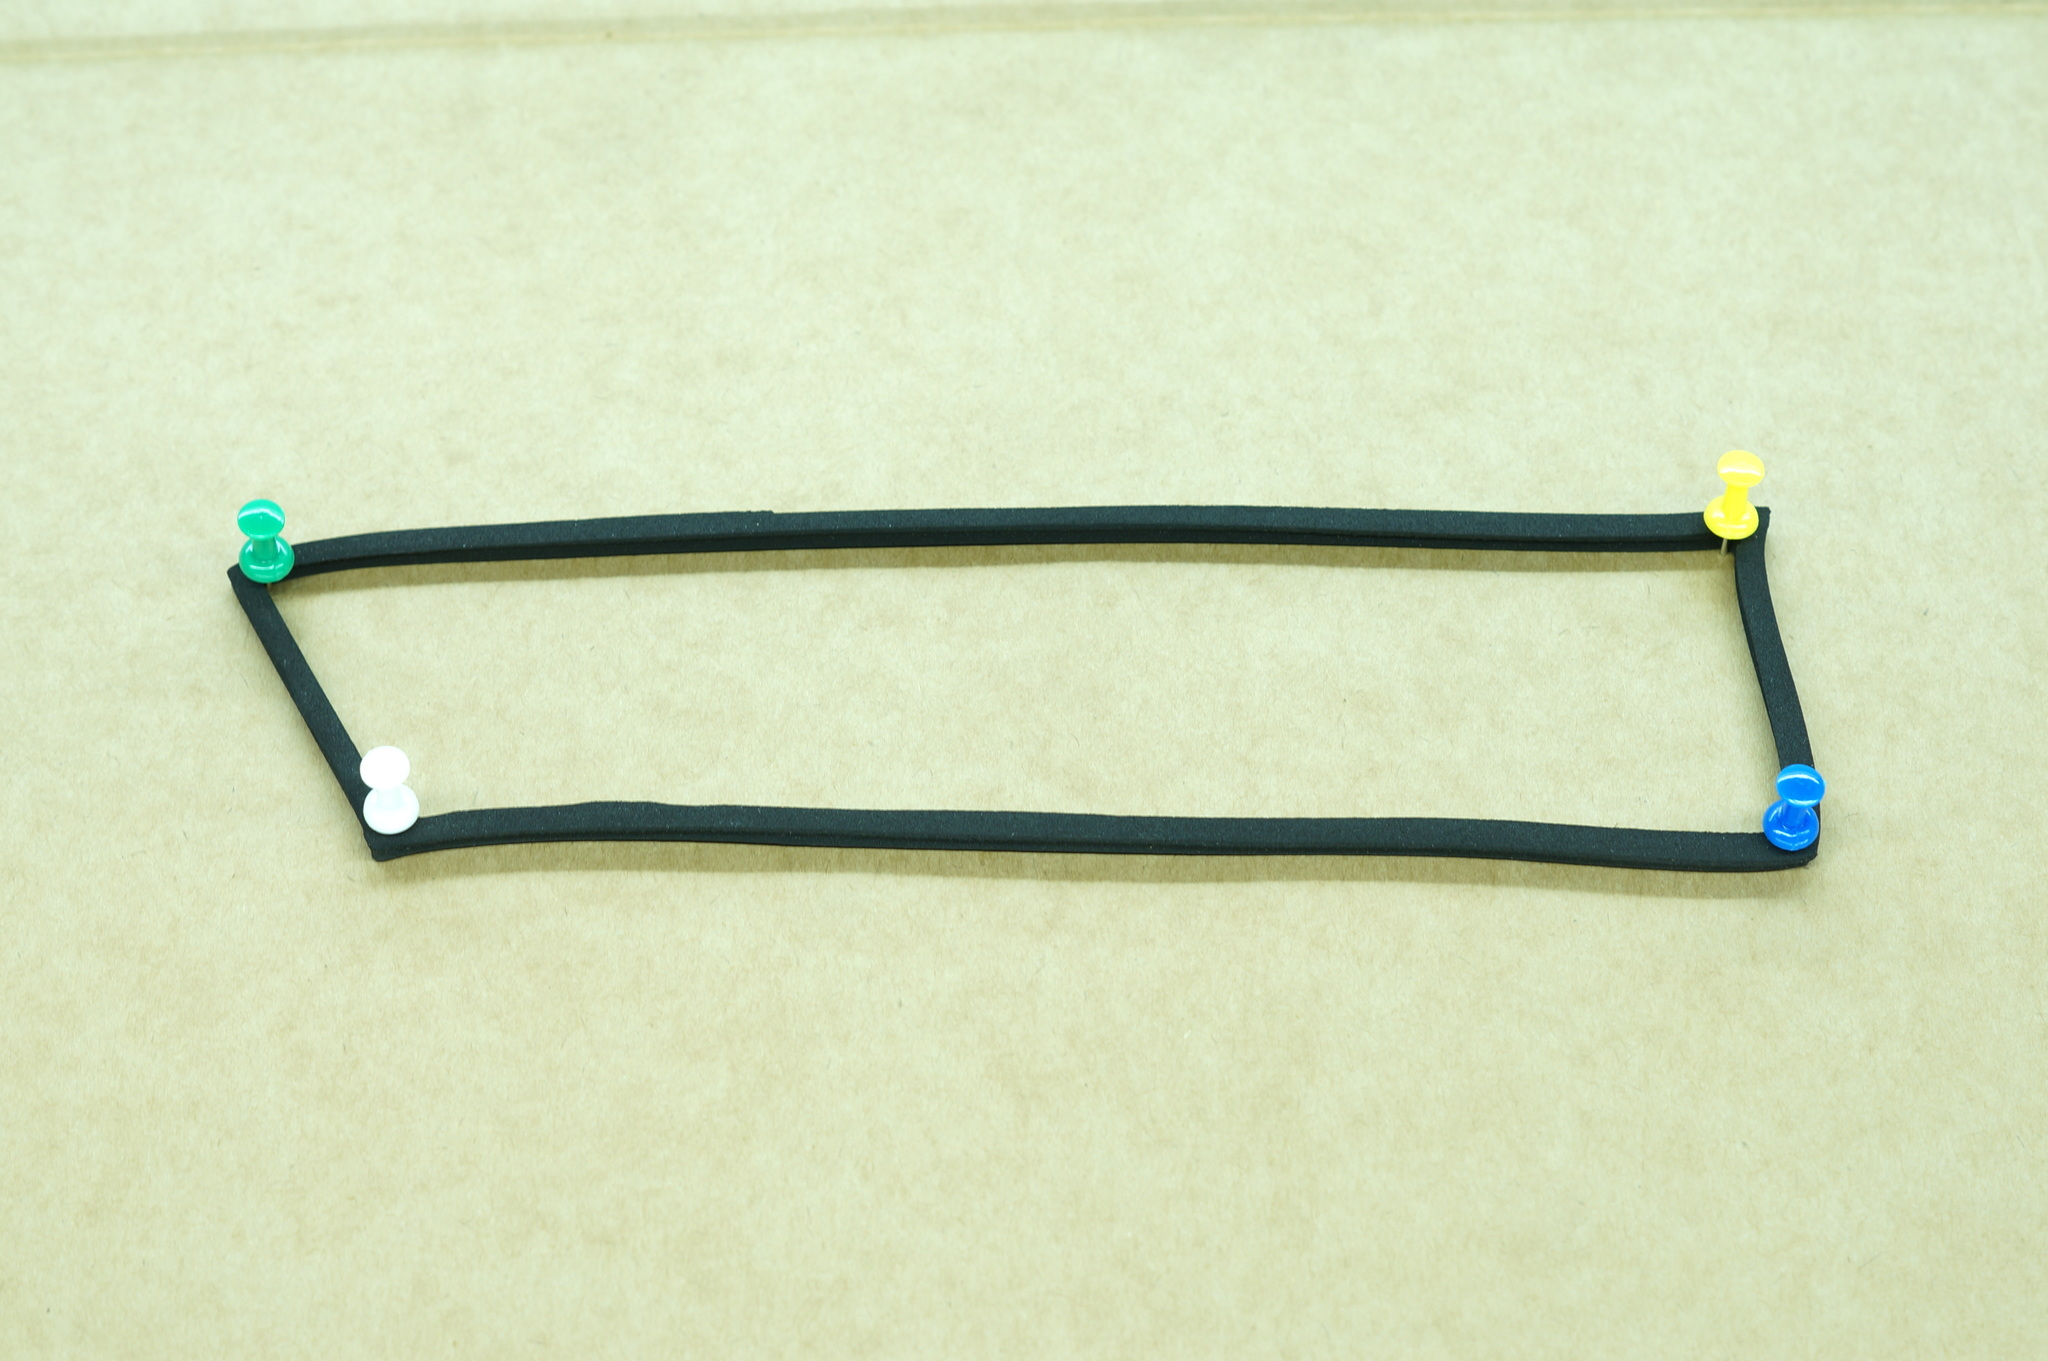 Прокладка стекла подфарника Газ 21 3 серии